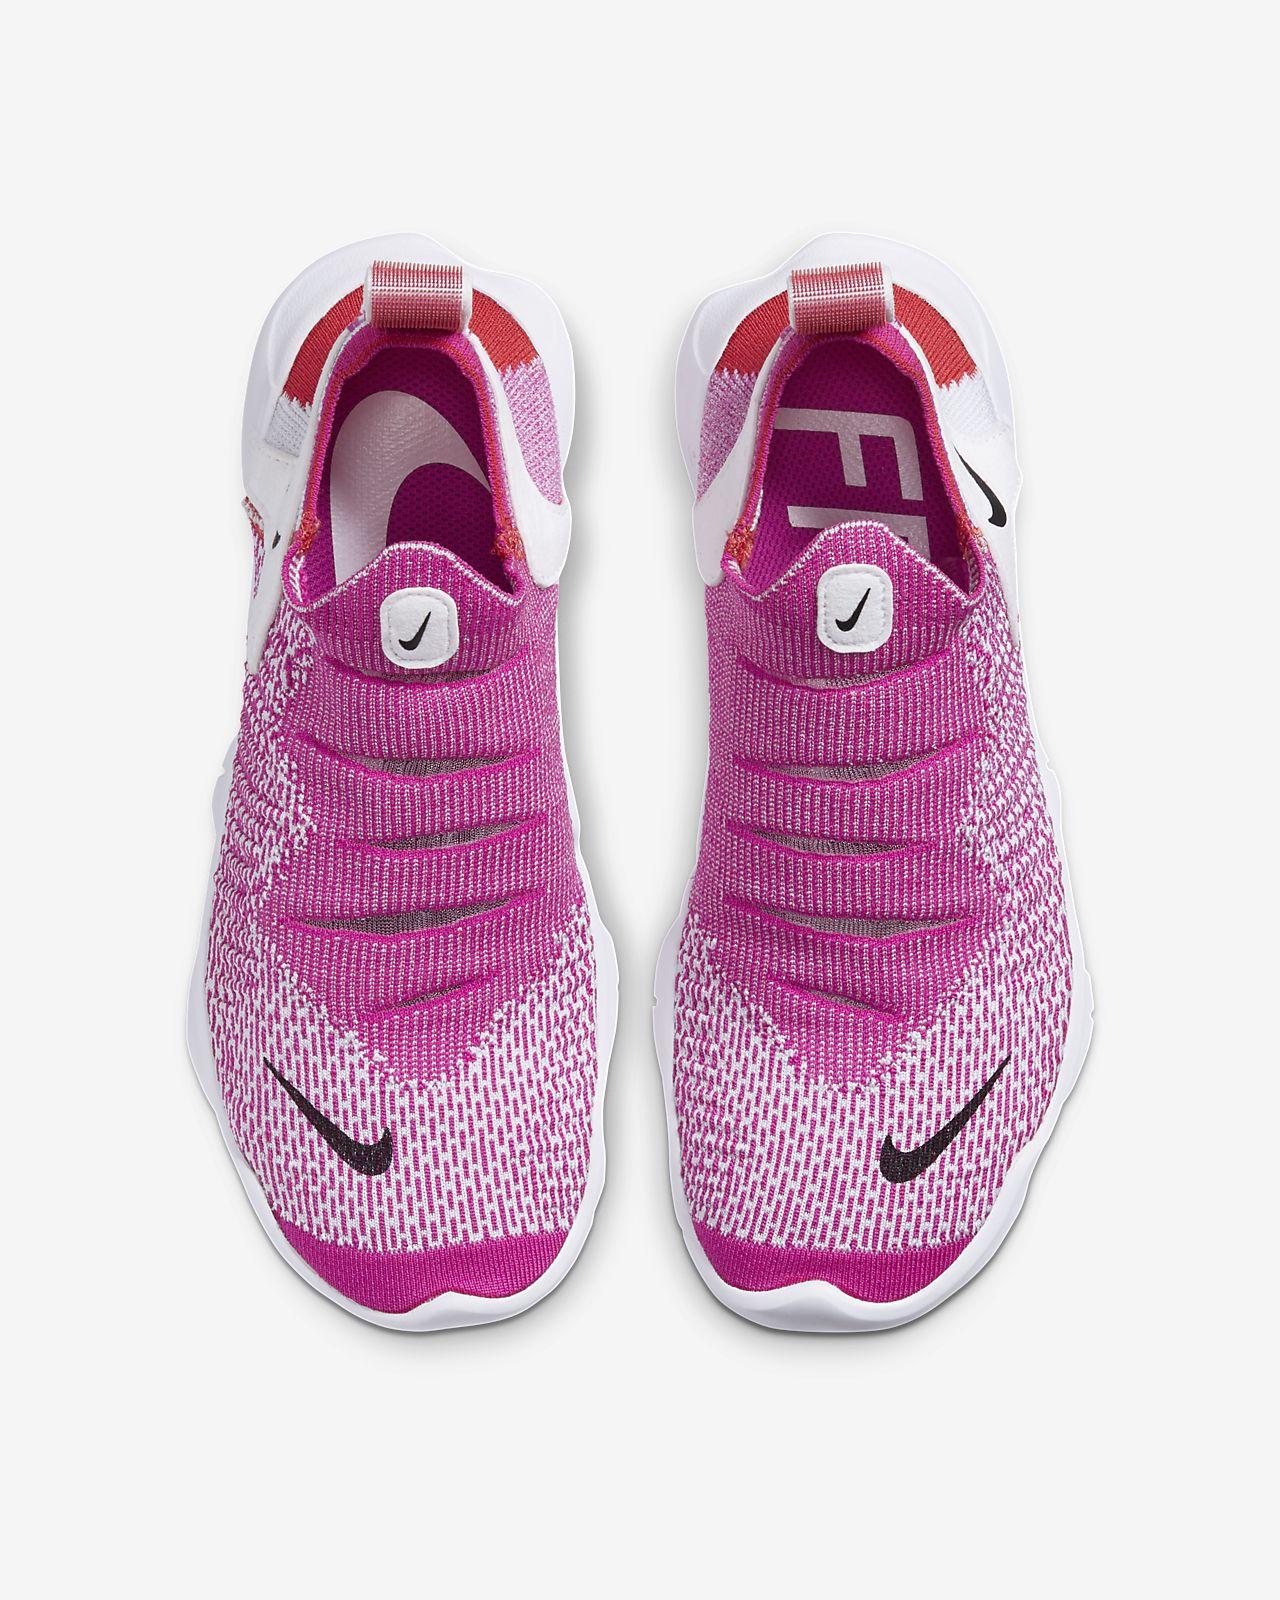 Calzado de running para mujer Nike Free RN Flyknit 3.0 2020